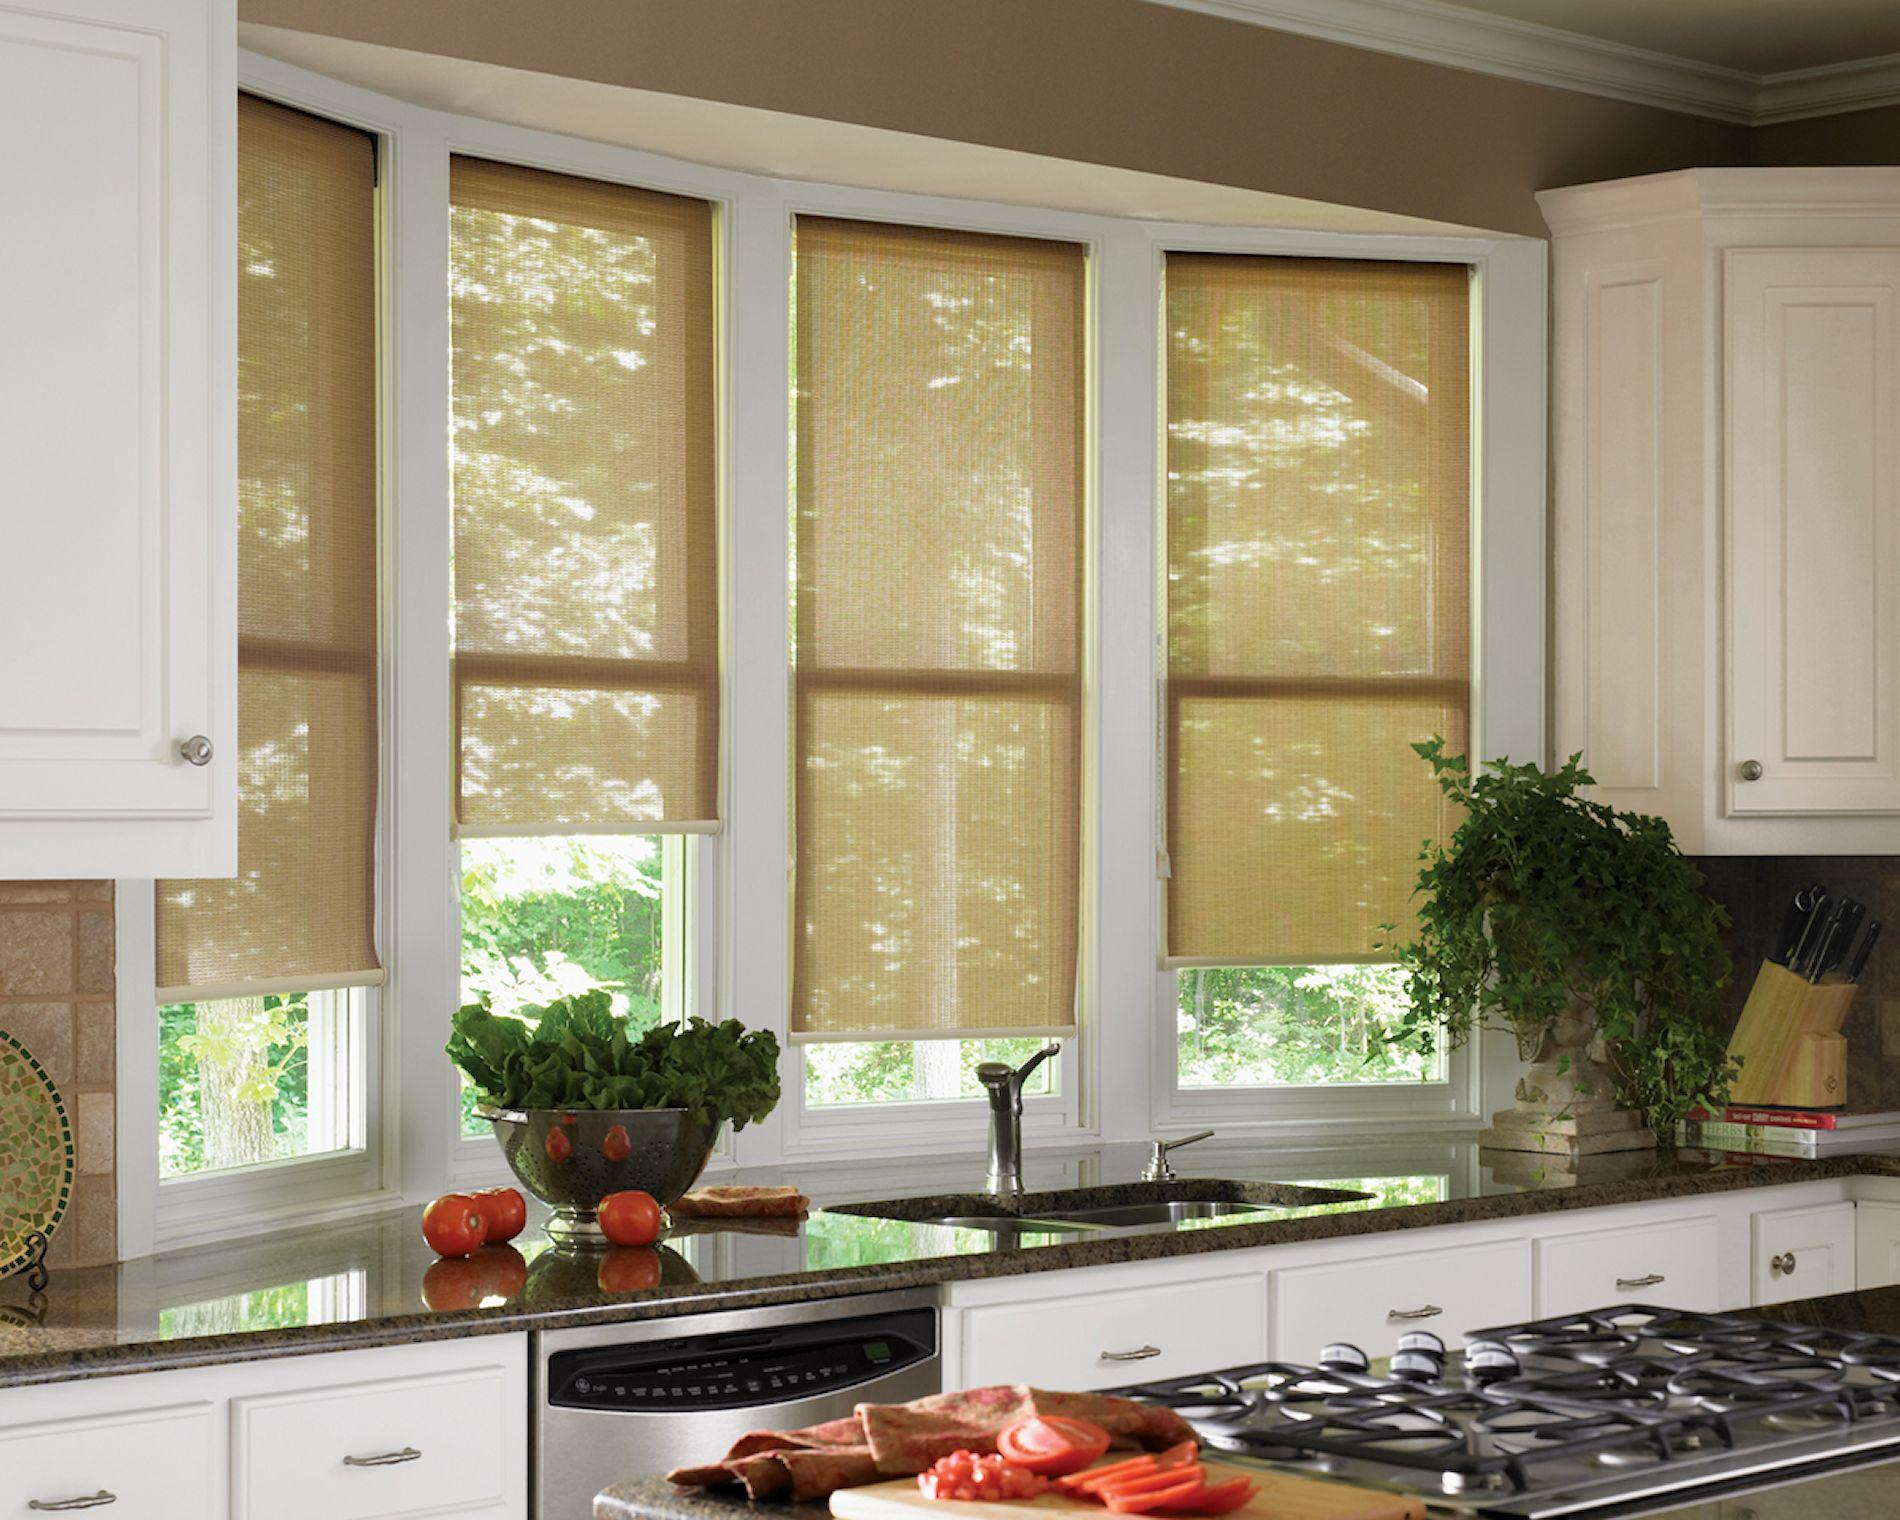 Рулонная штора на окне на кухне